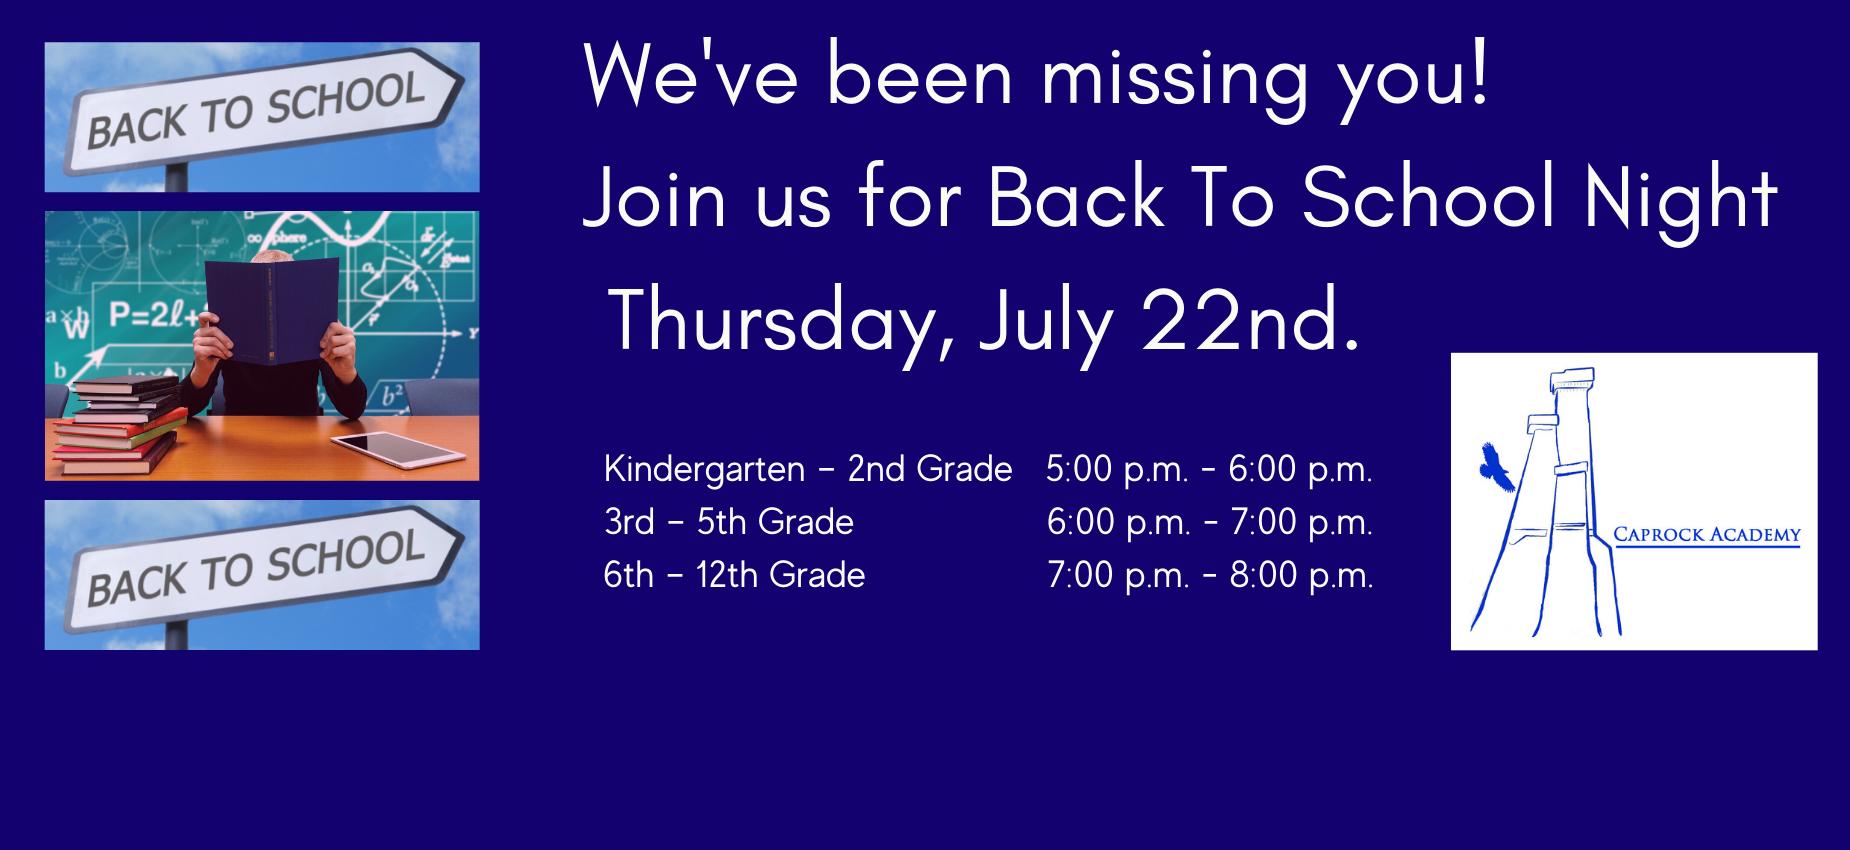 Back to school night Thursday, July 22nd.